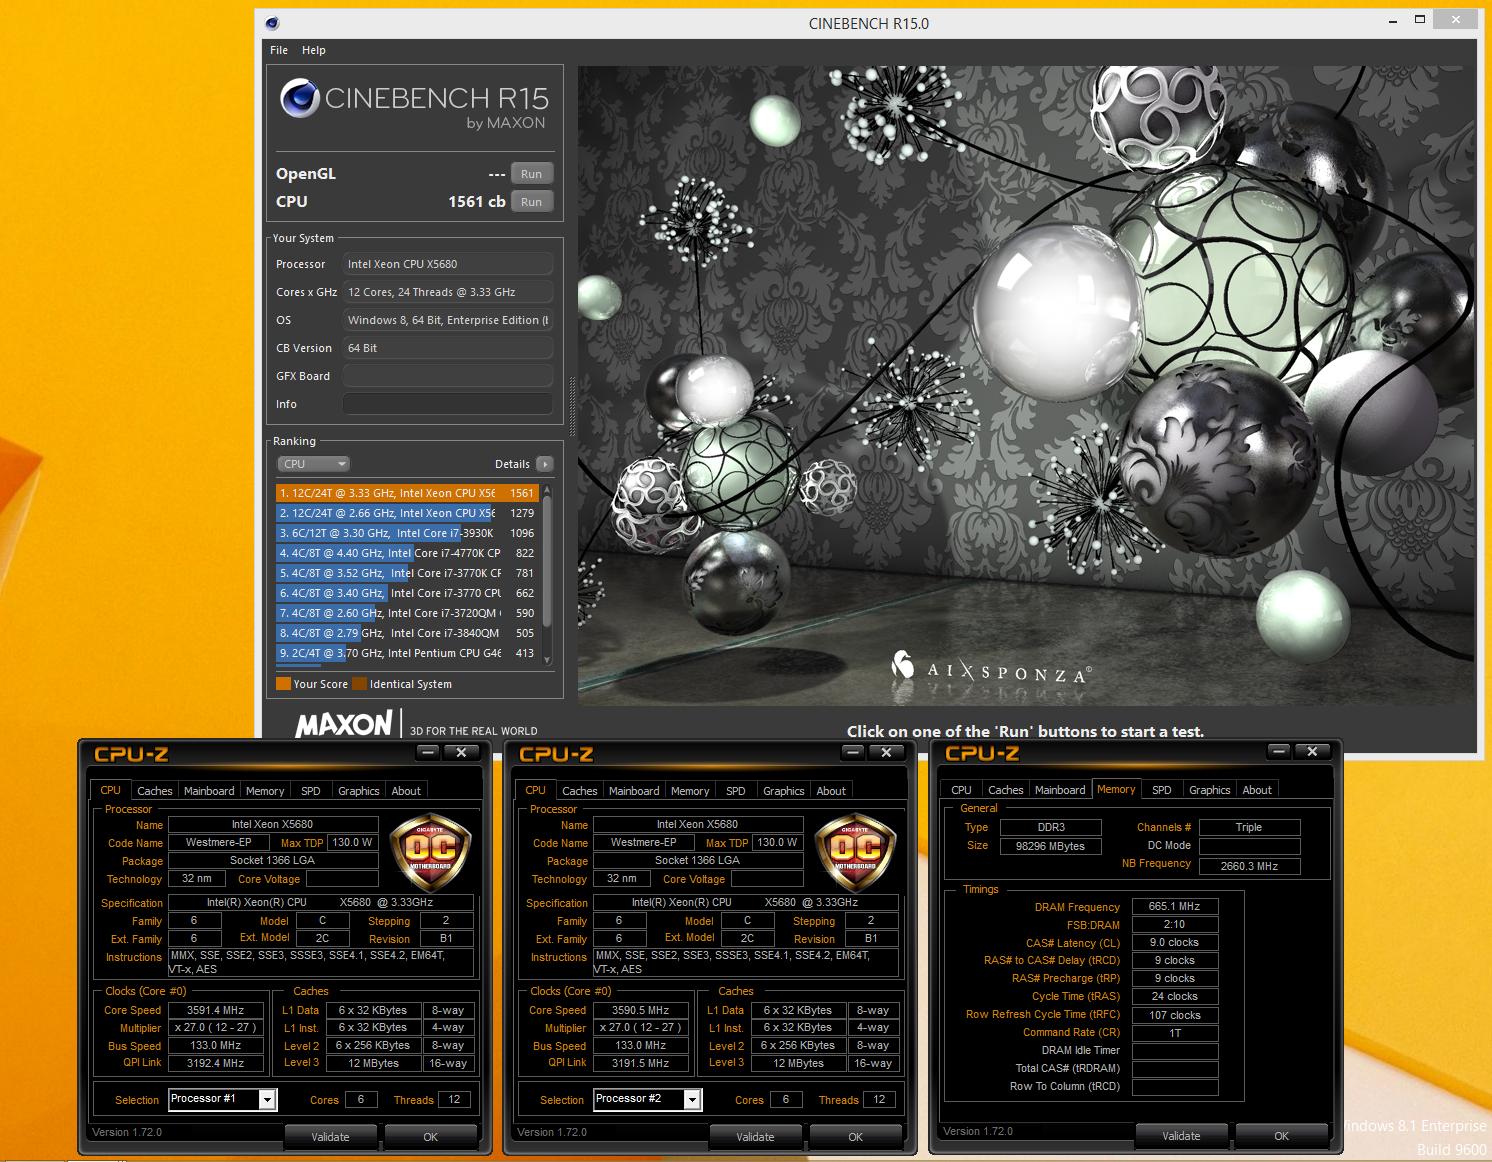 CL3P20`s Cinebench - R15 score: 1561 cb with a Xeon X5680